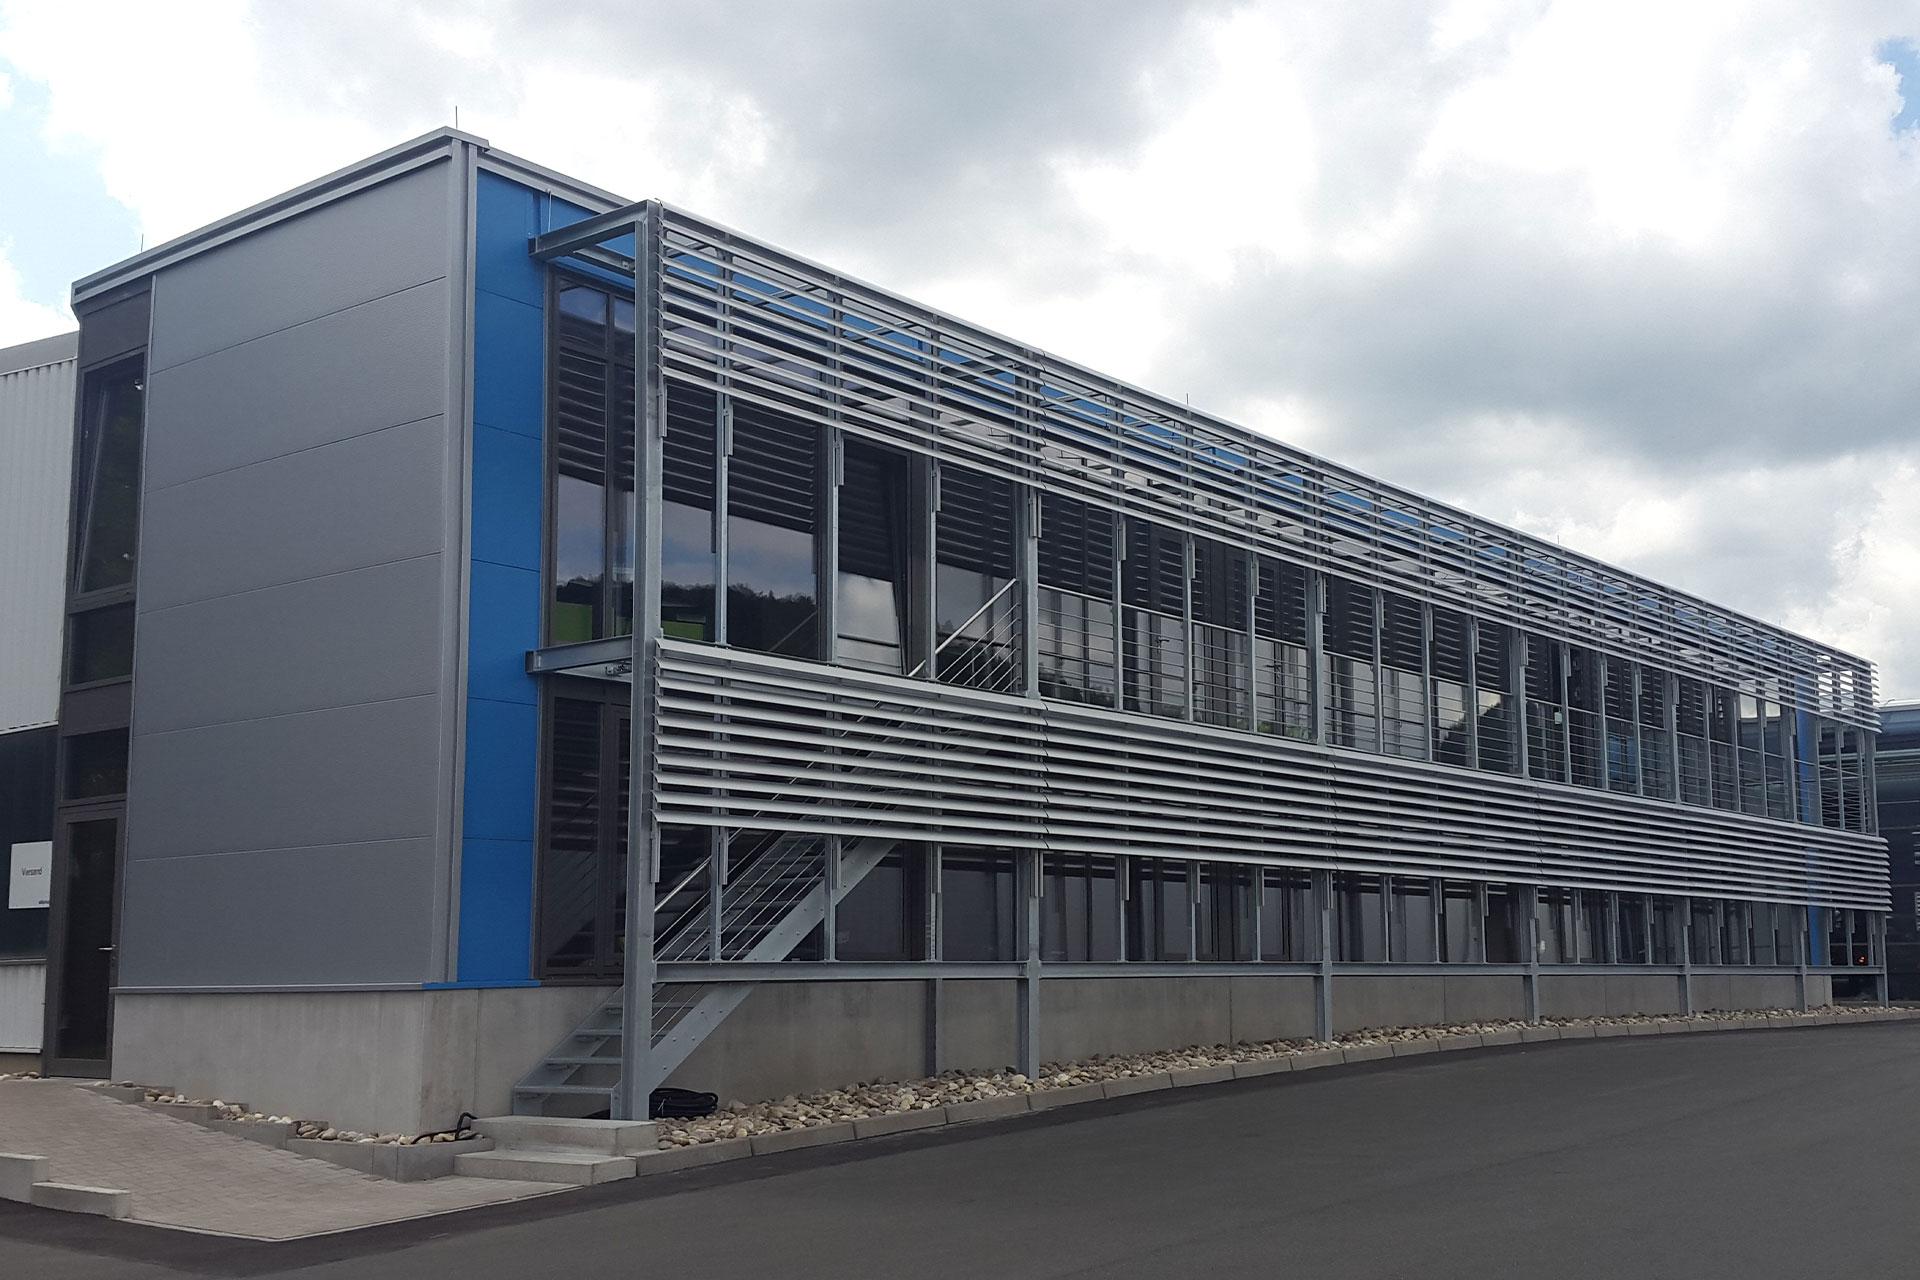 Projekte im Stahlbau